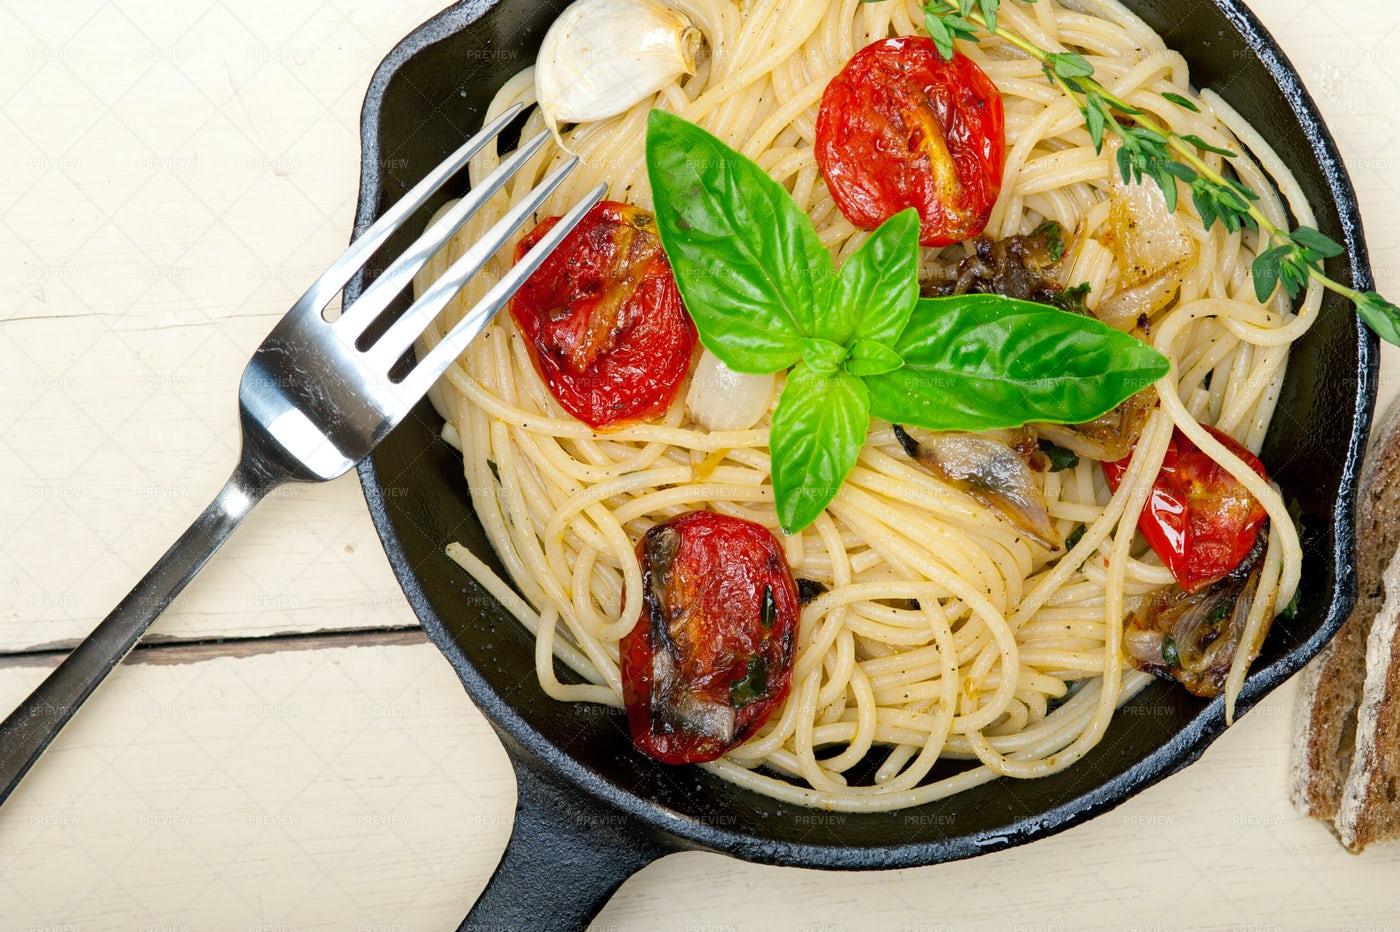 Spaghetti With Baked Cherry Tomatoes: Stock Photos